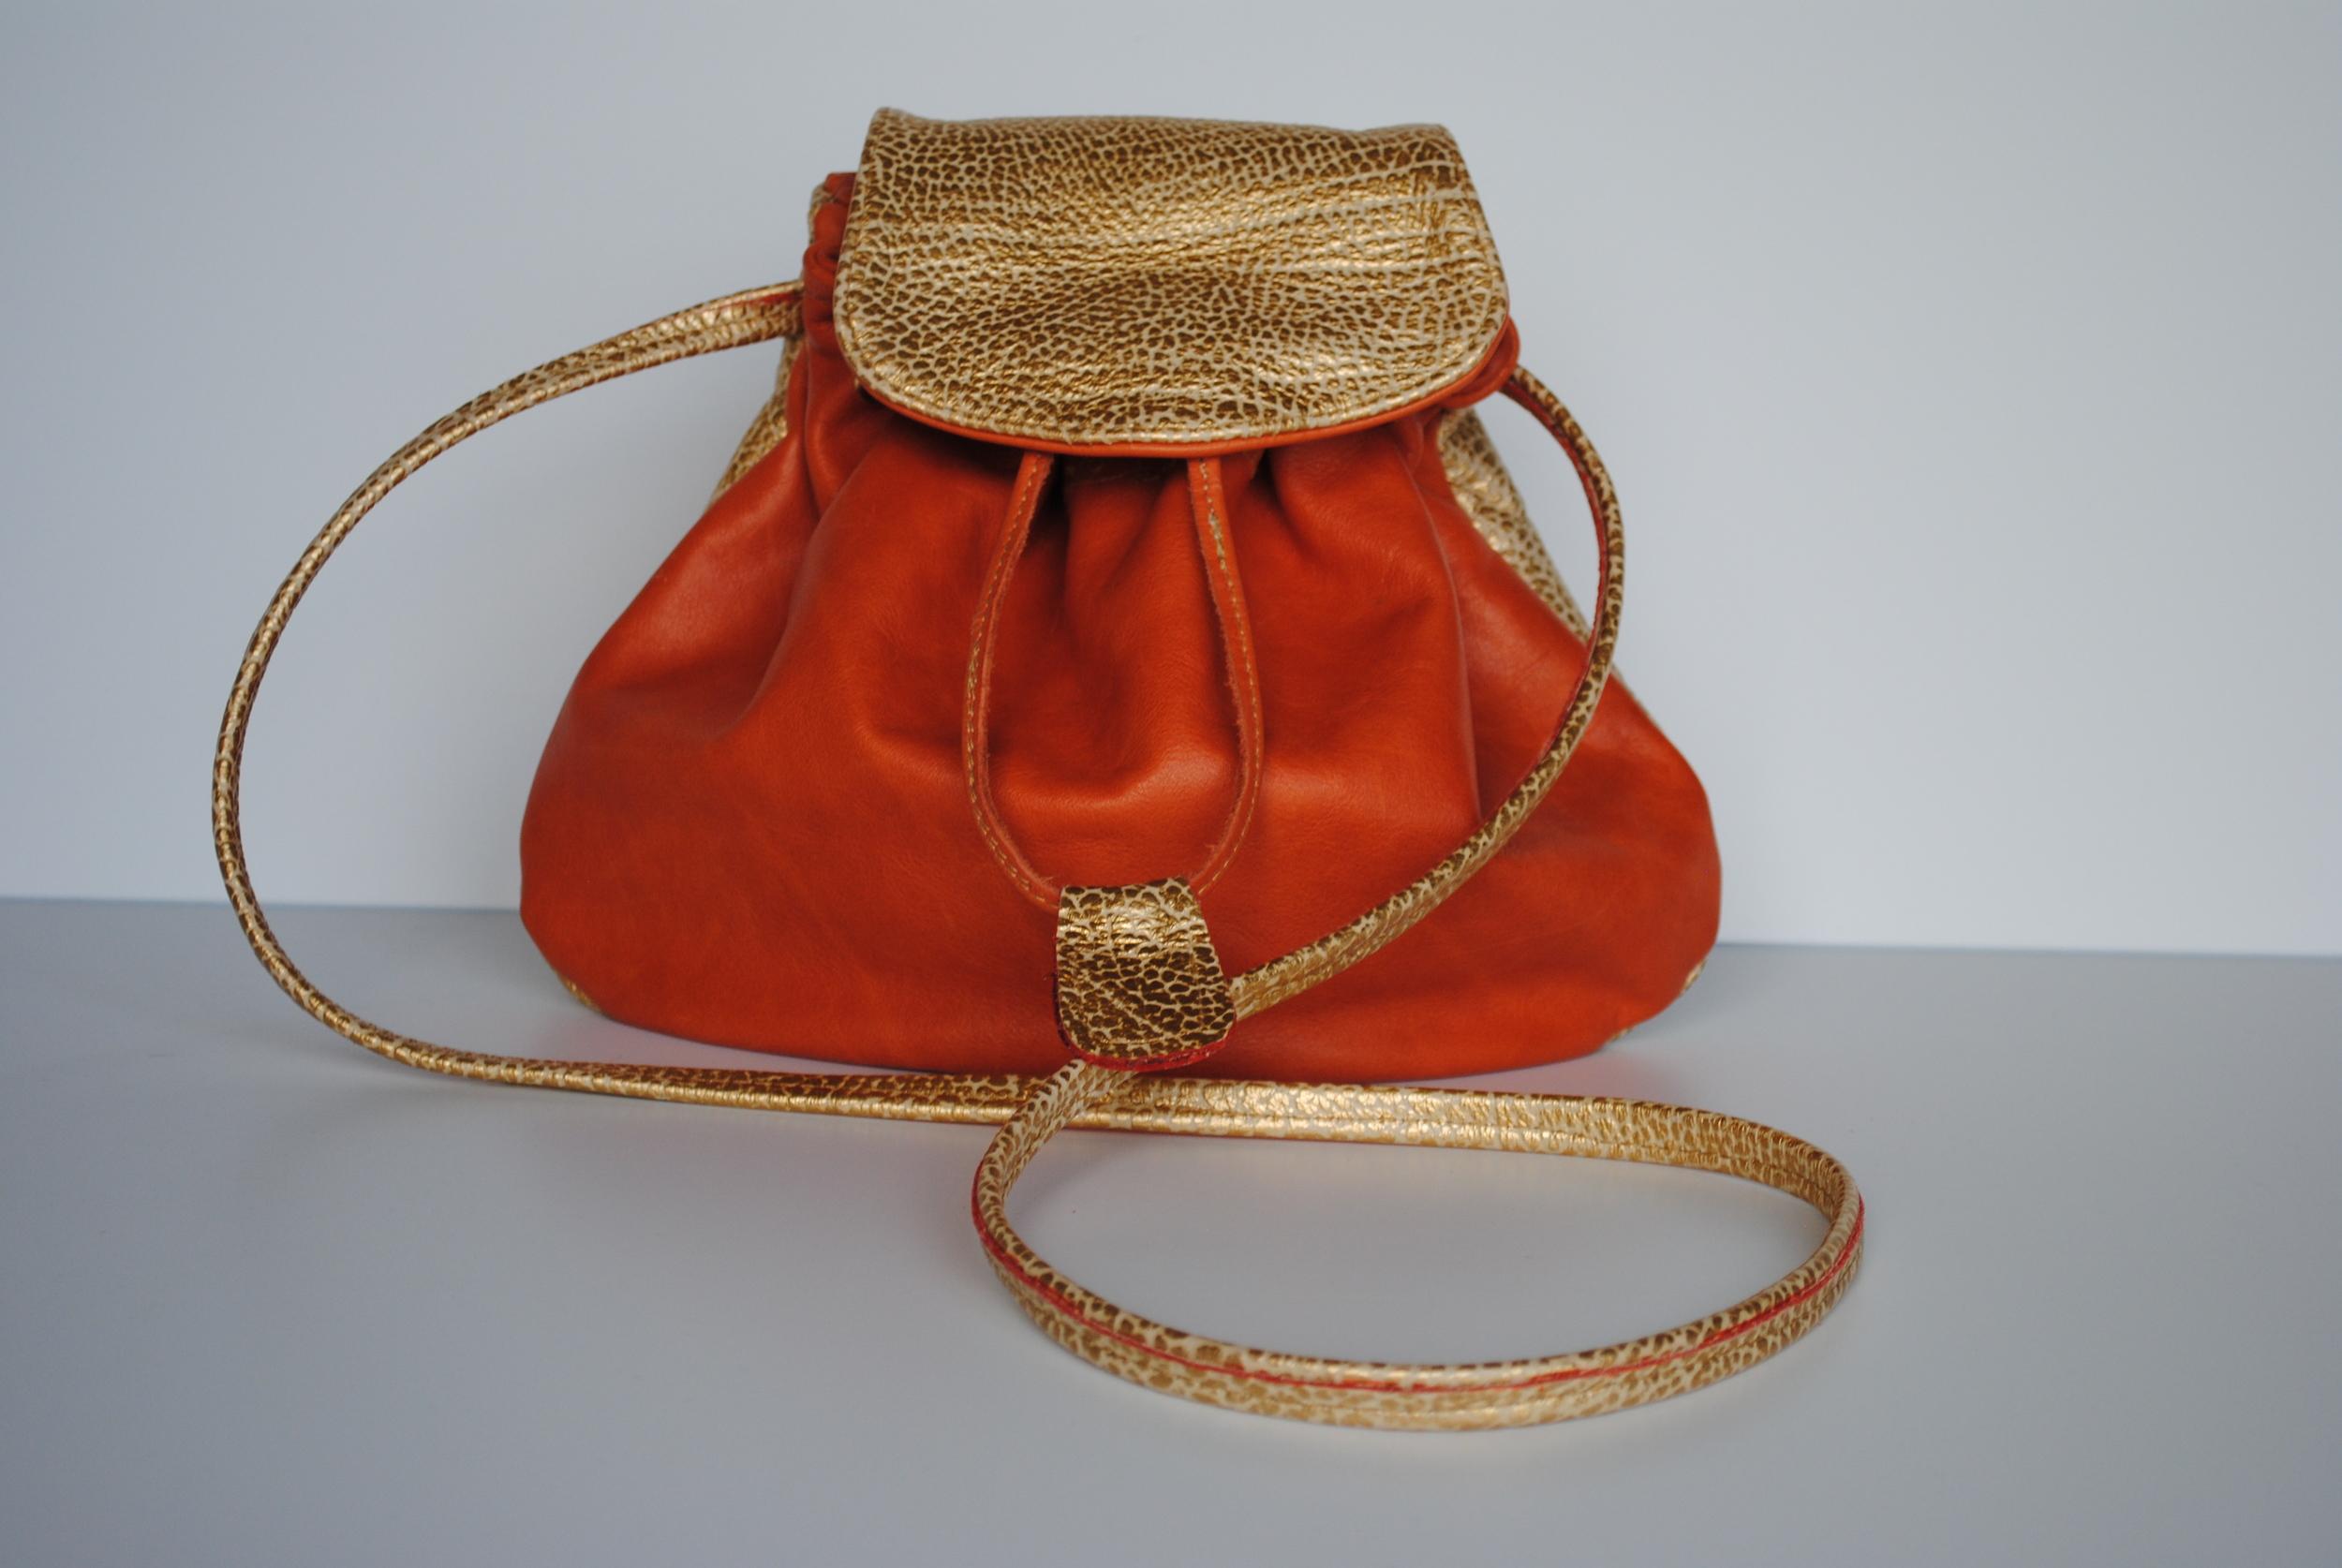 Kursheed All Leather Tangerine and Gold   Drawstring Batwa